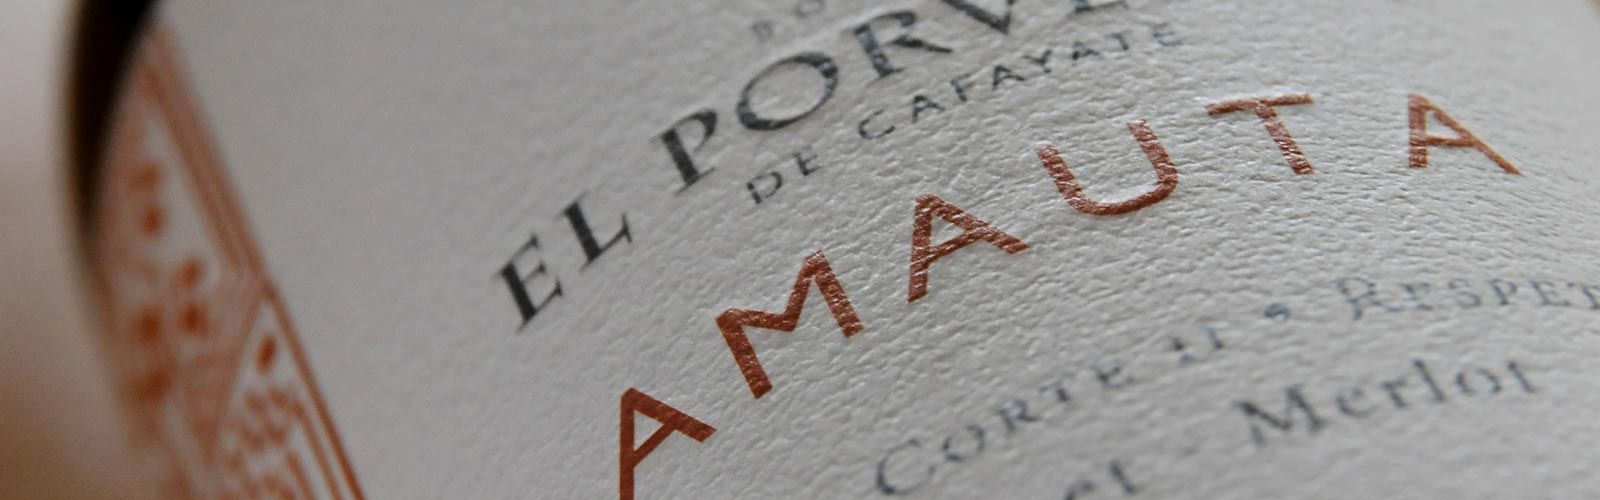 header-wine-amauta